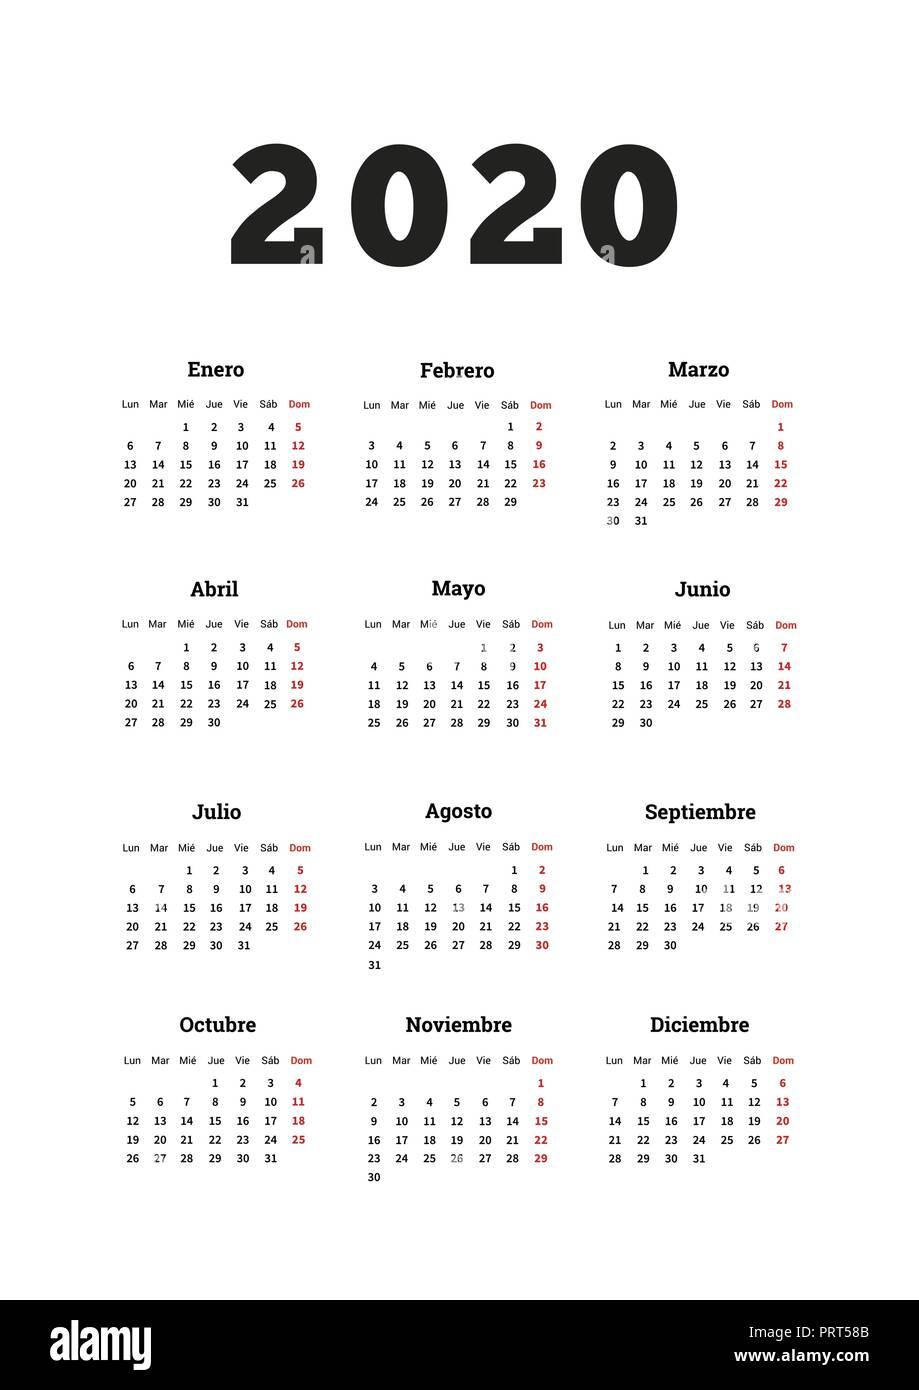 Calendario Del Ano 2020 En Espanol.Ano 2020 Calendario Simple En Espanol Tamano A4 Hoja